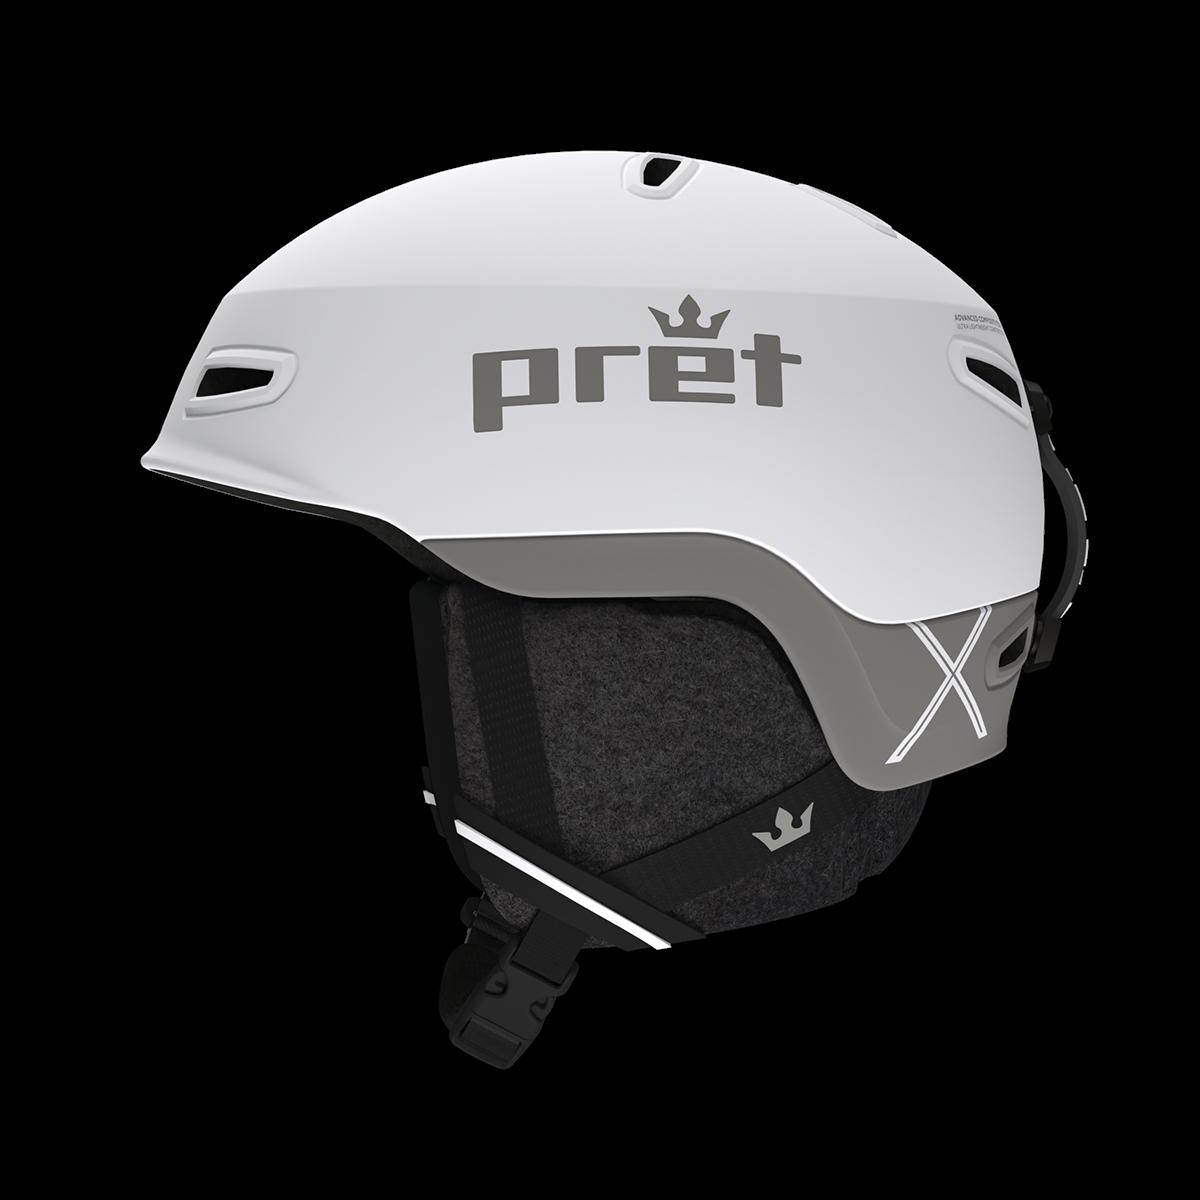 Pret Moxie X Helmets